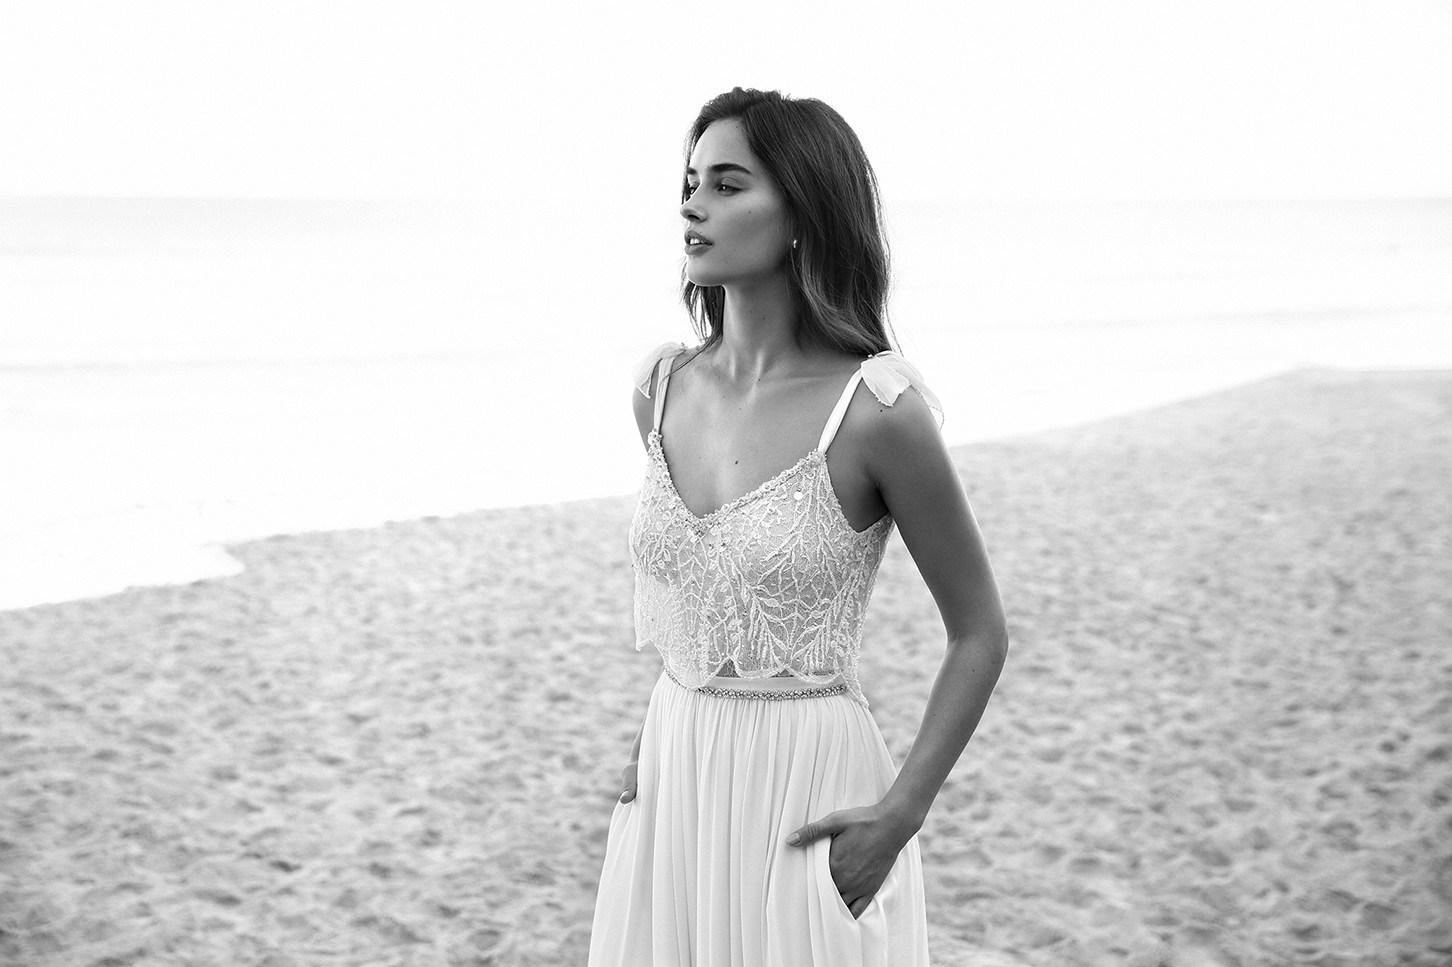 2019 kant boho trouwjurken spaghetti hals boog lihi hod kralen backless bruid jassen 2017-2018 vintage strand chiffon trouwjurk